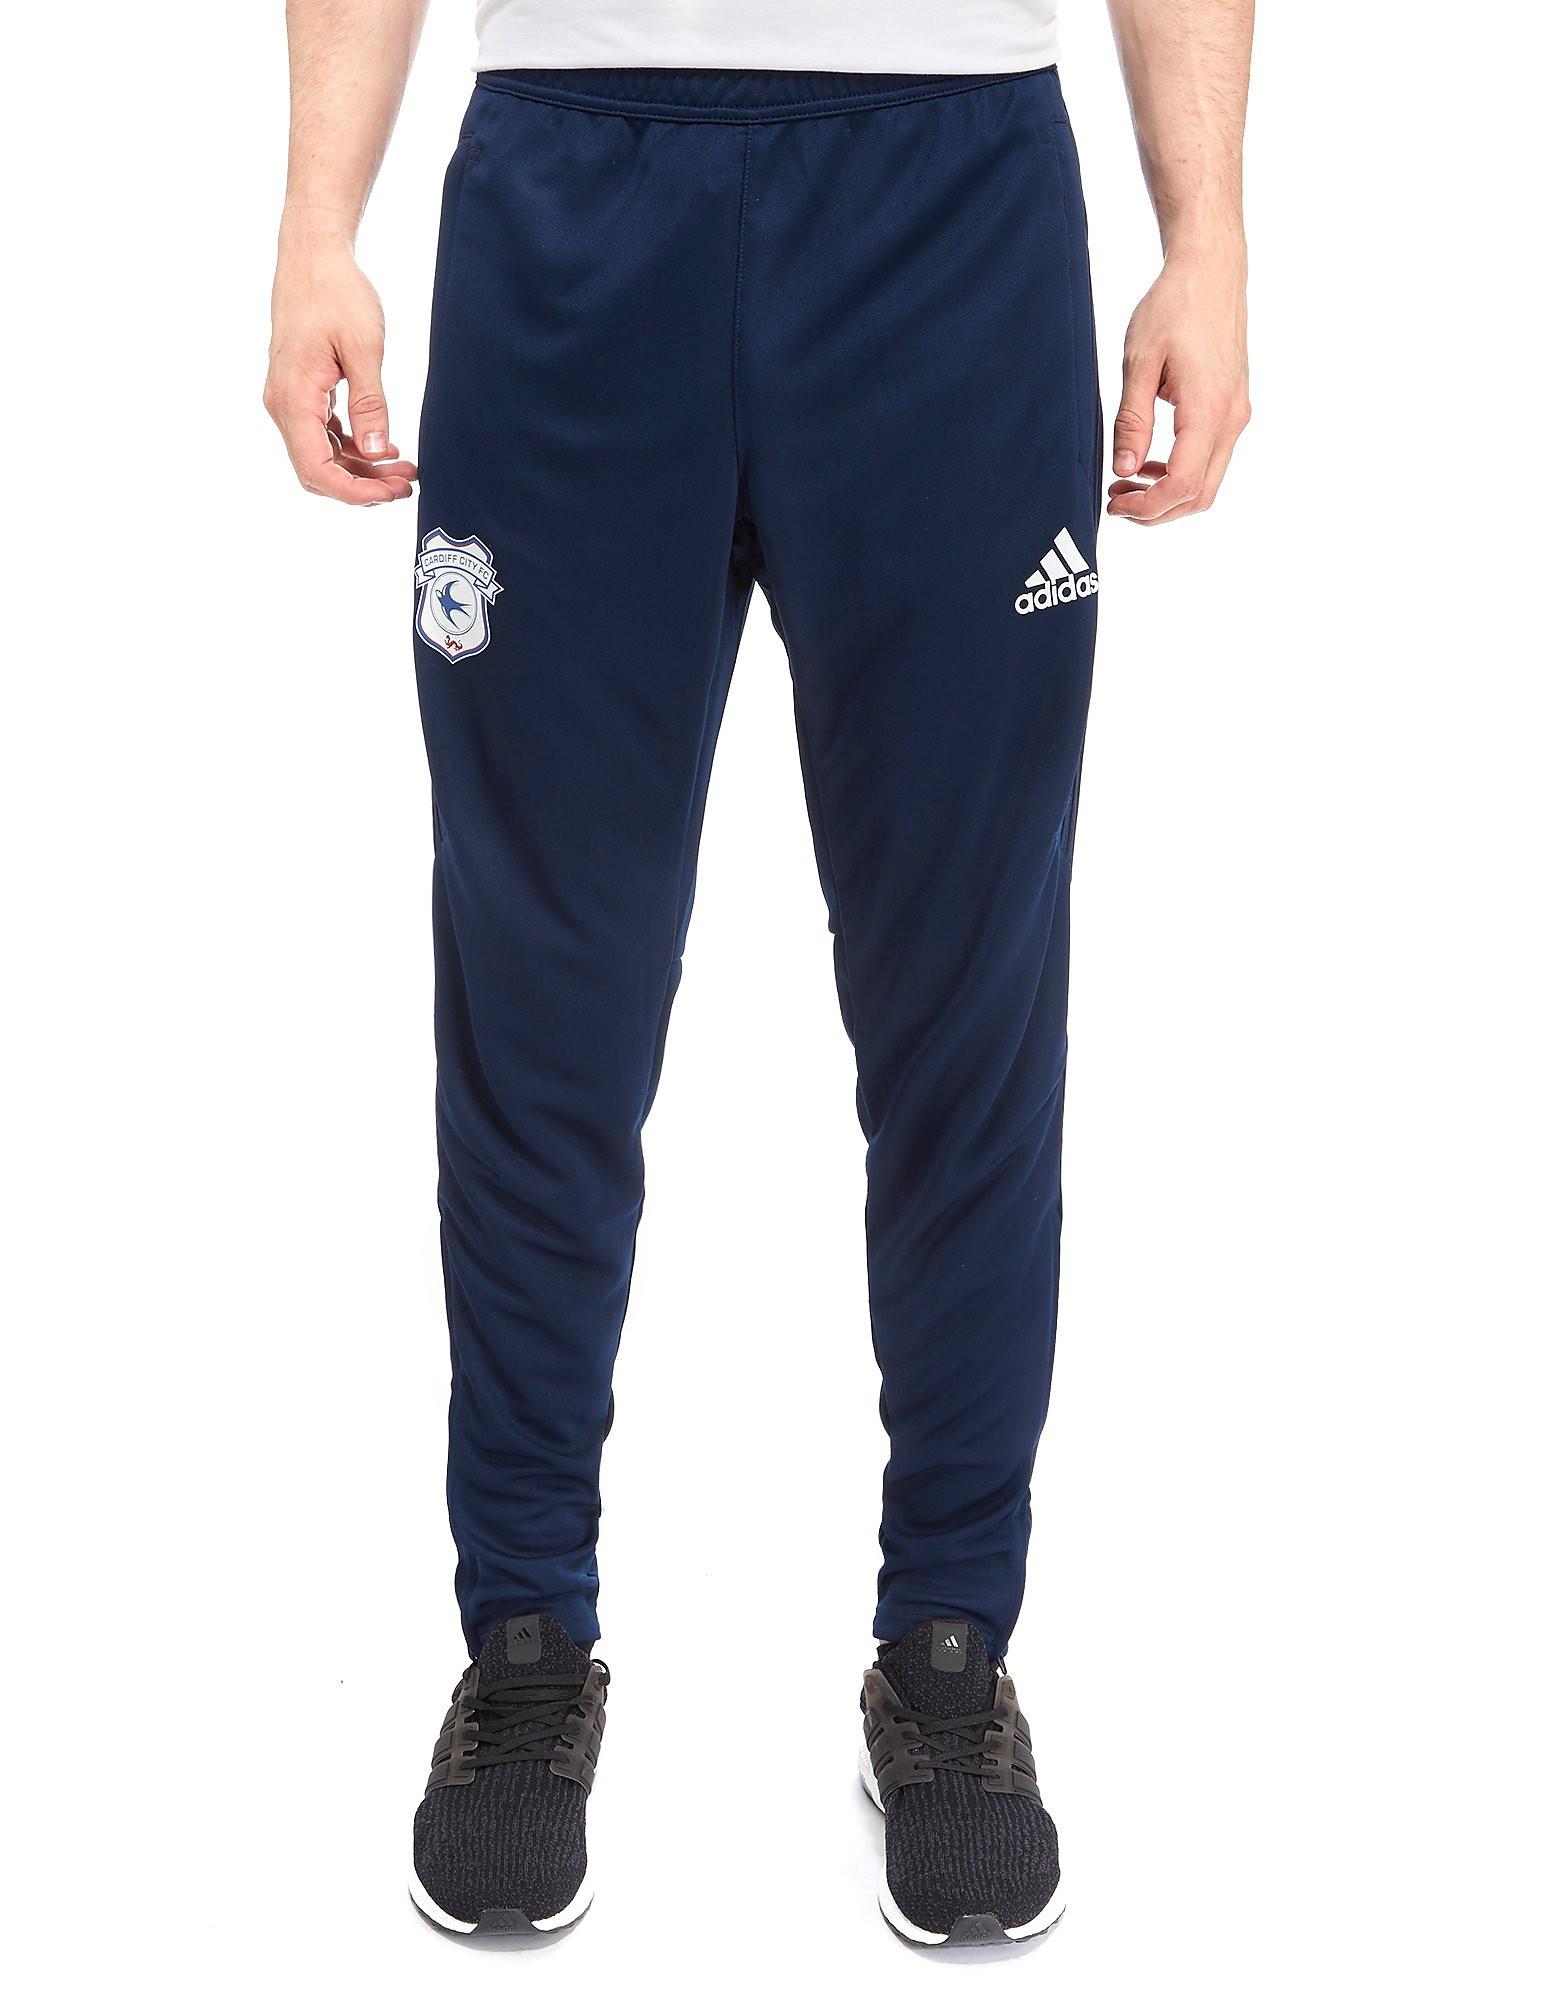 adidas Cardiff City 2017/18 Training Pants